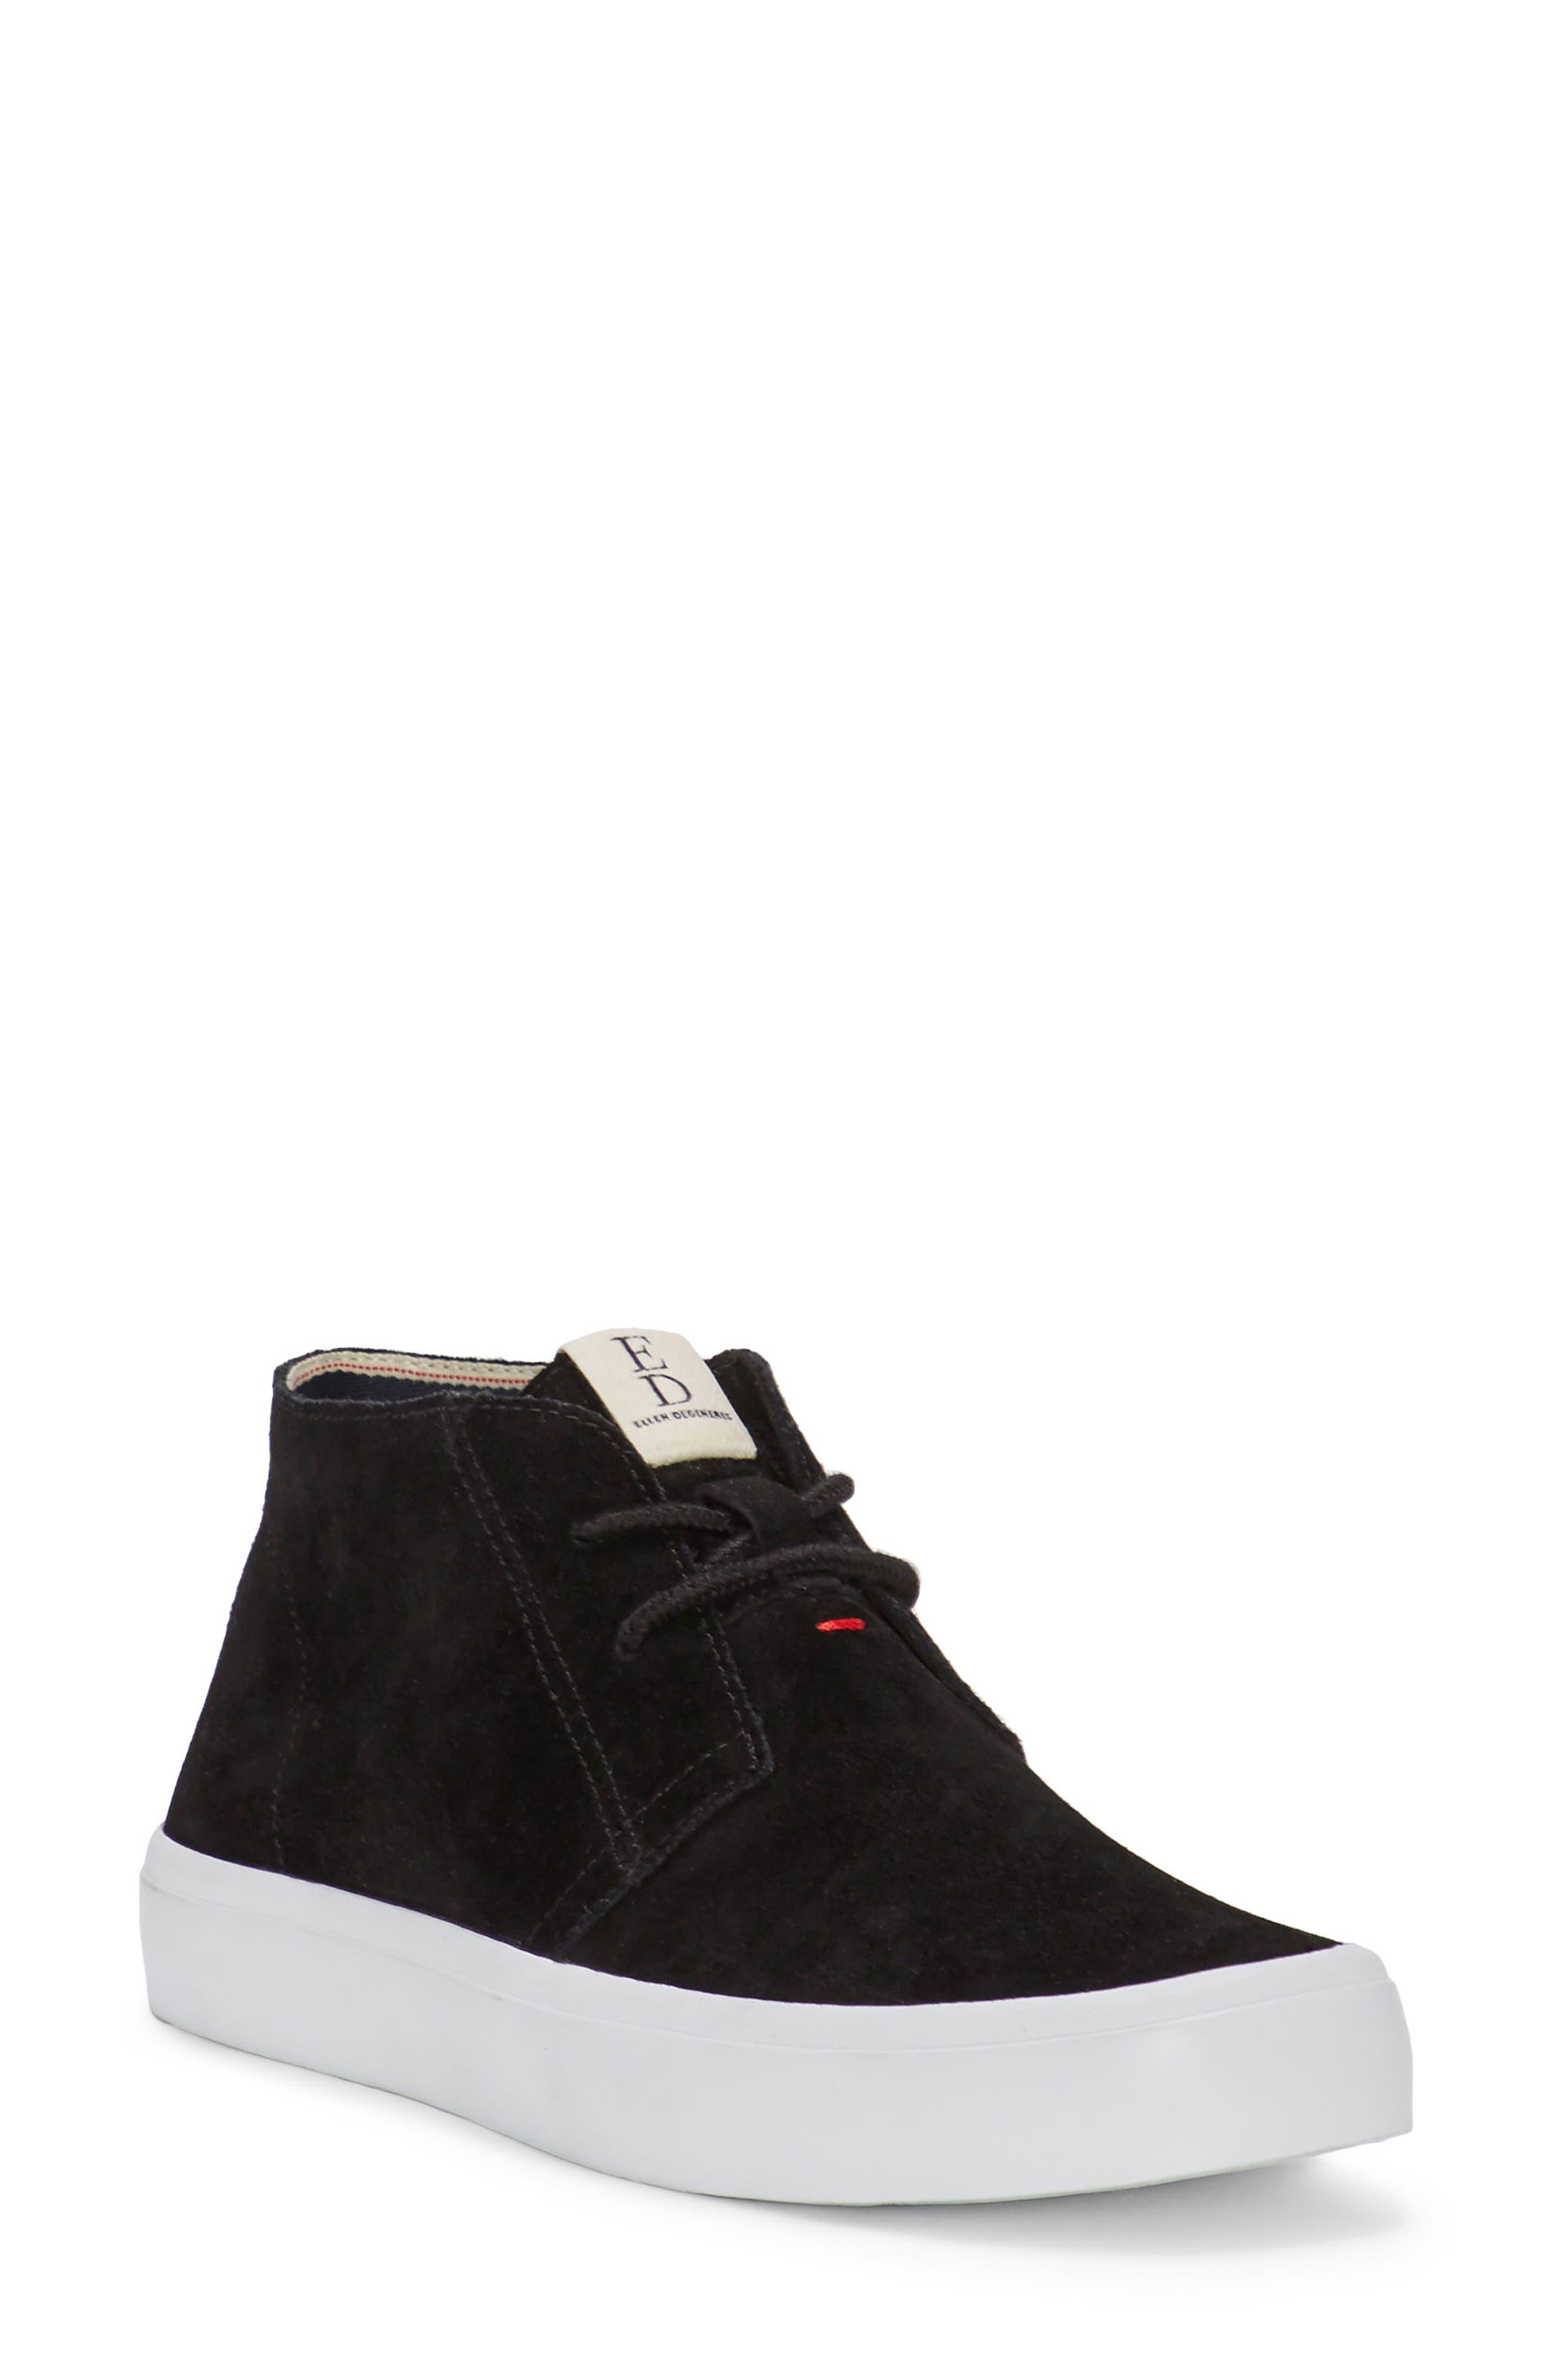 Dax Chukka Sneaker,                         Main,                         color, 002